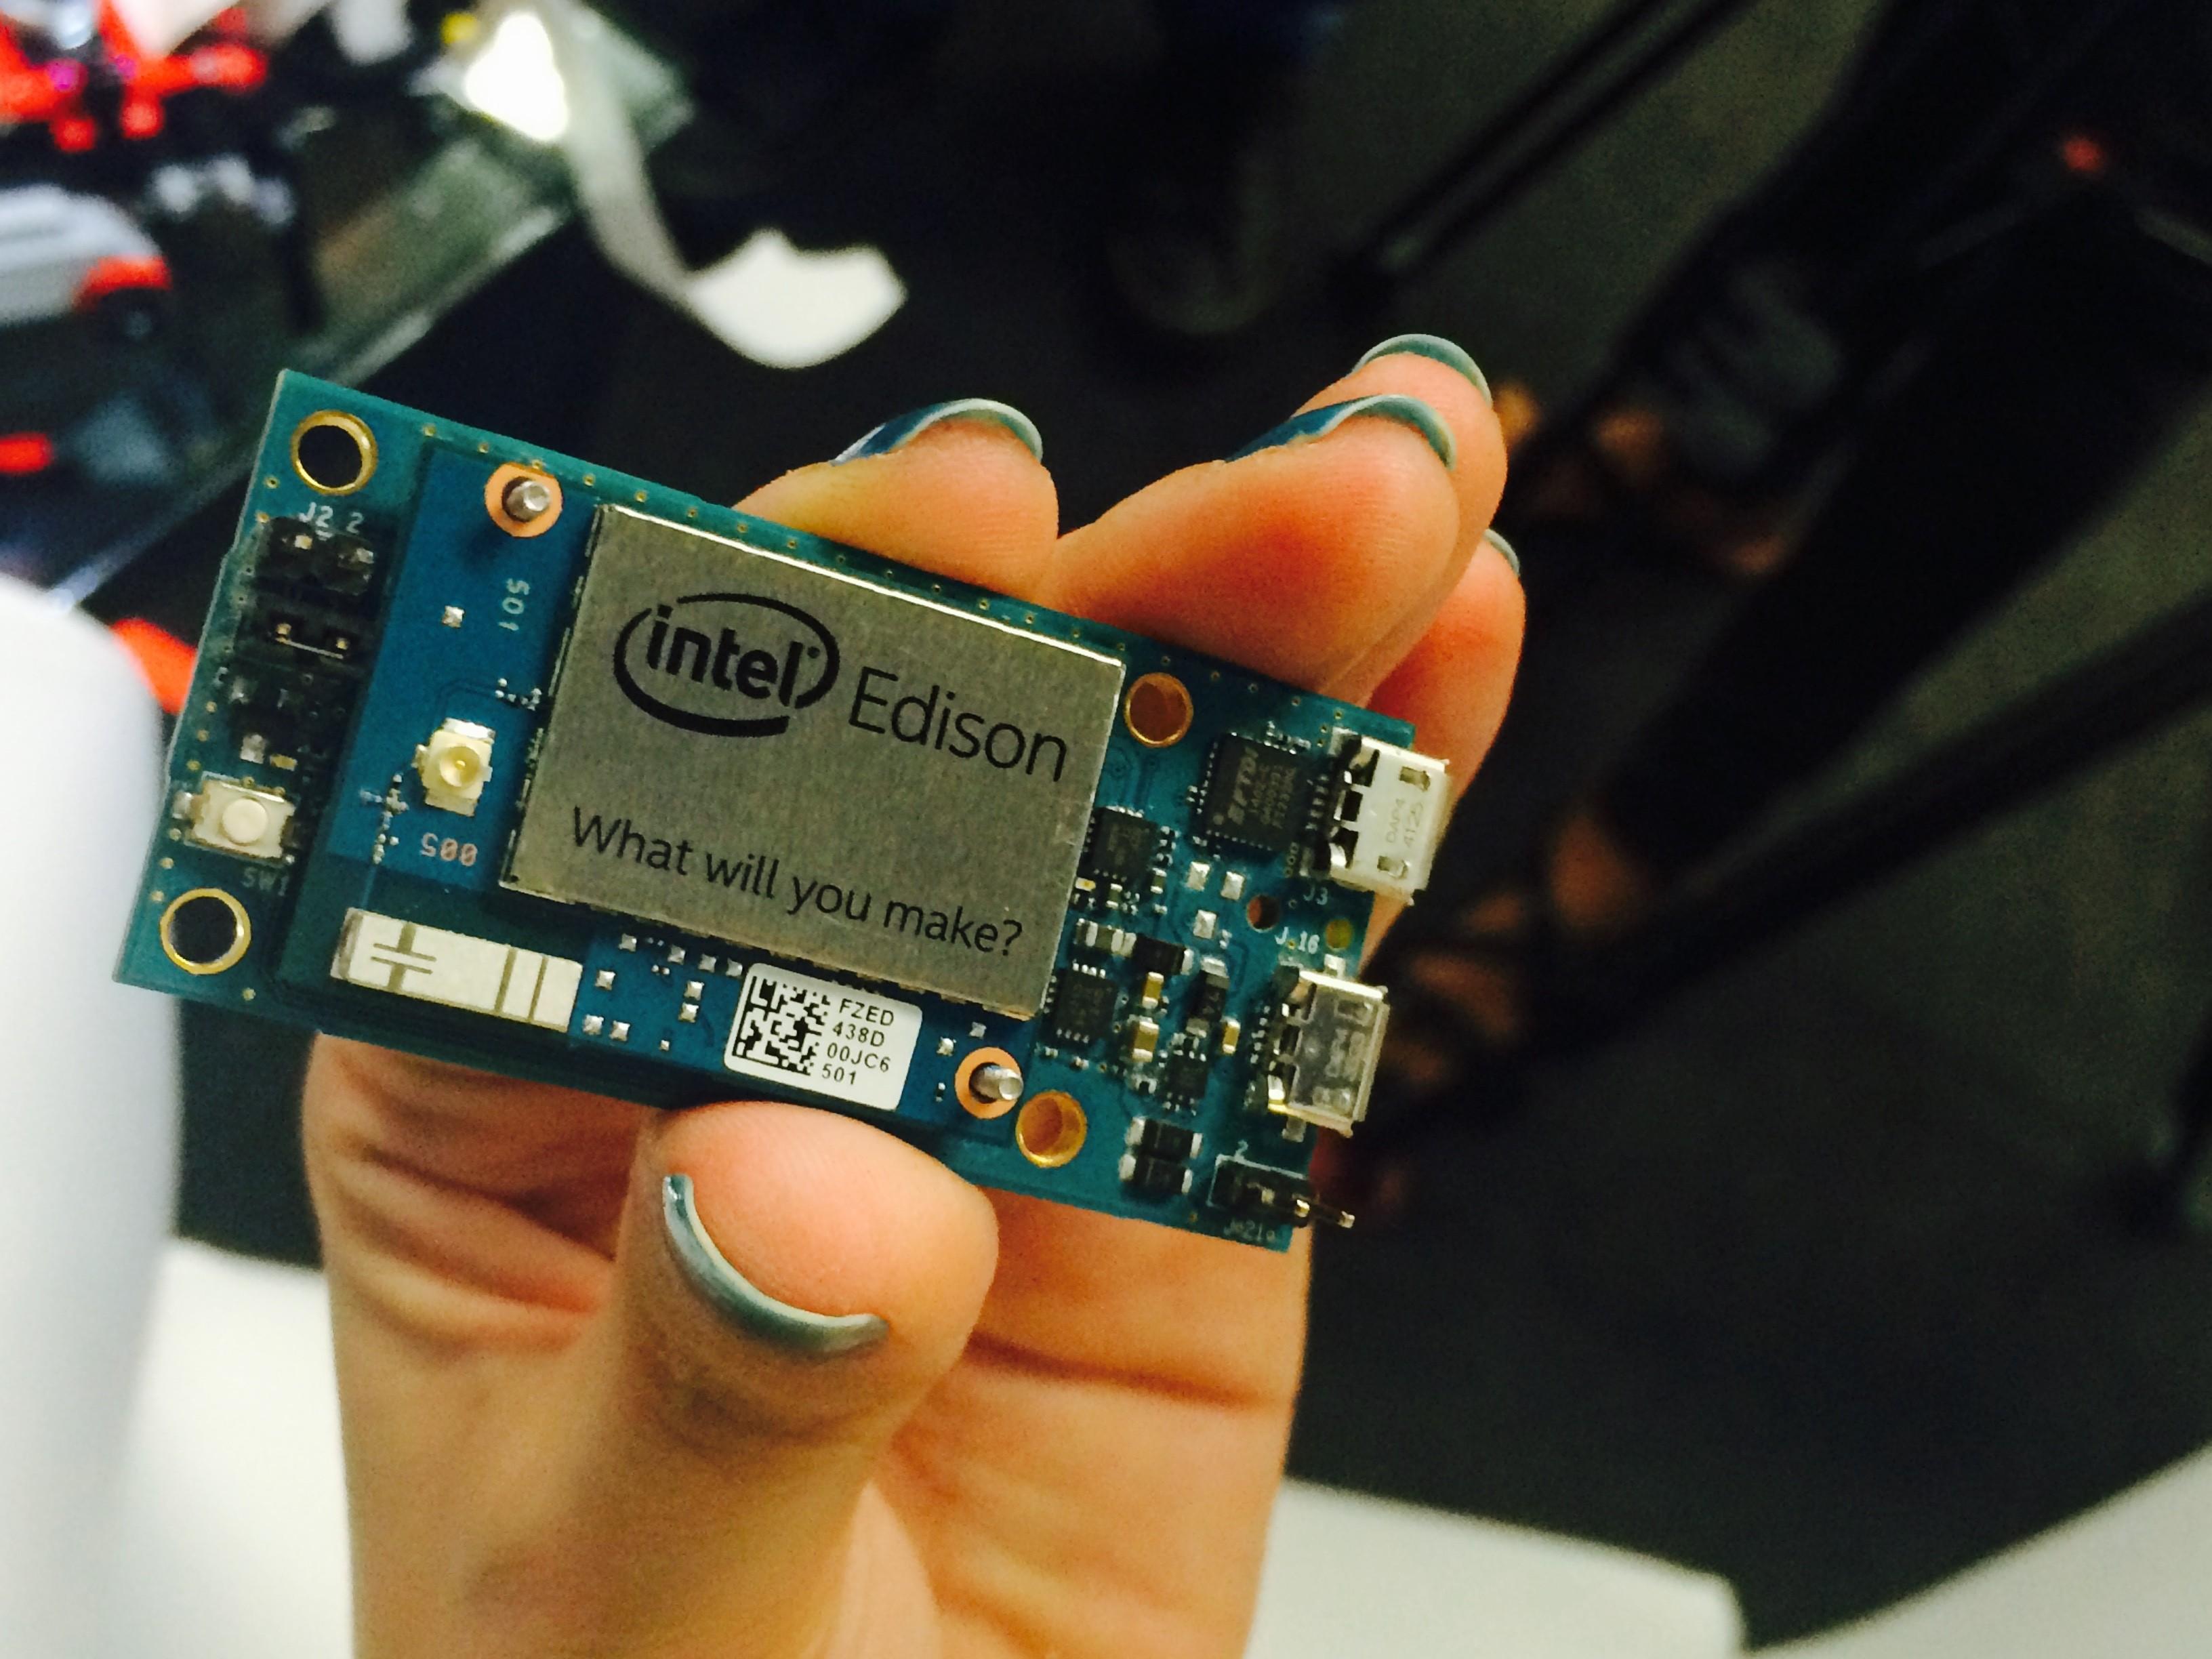 microcomputador intel